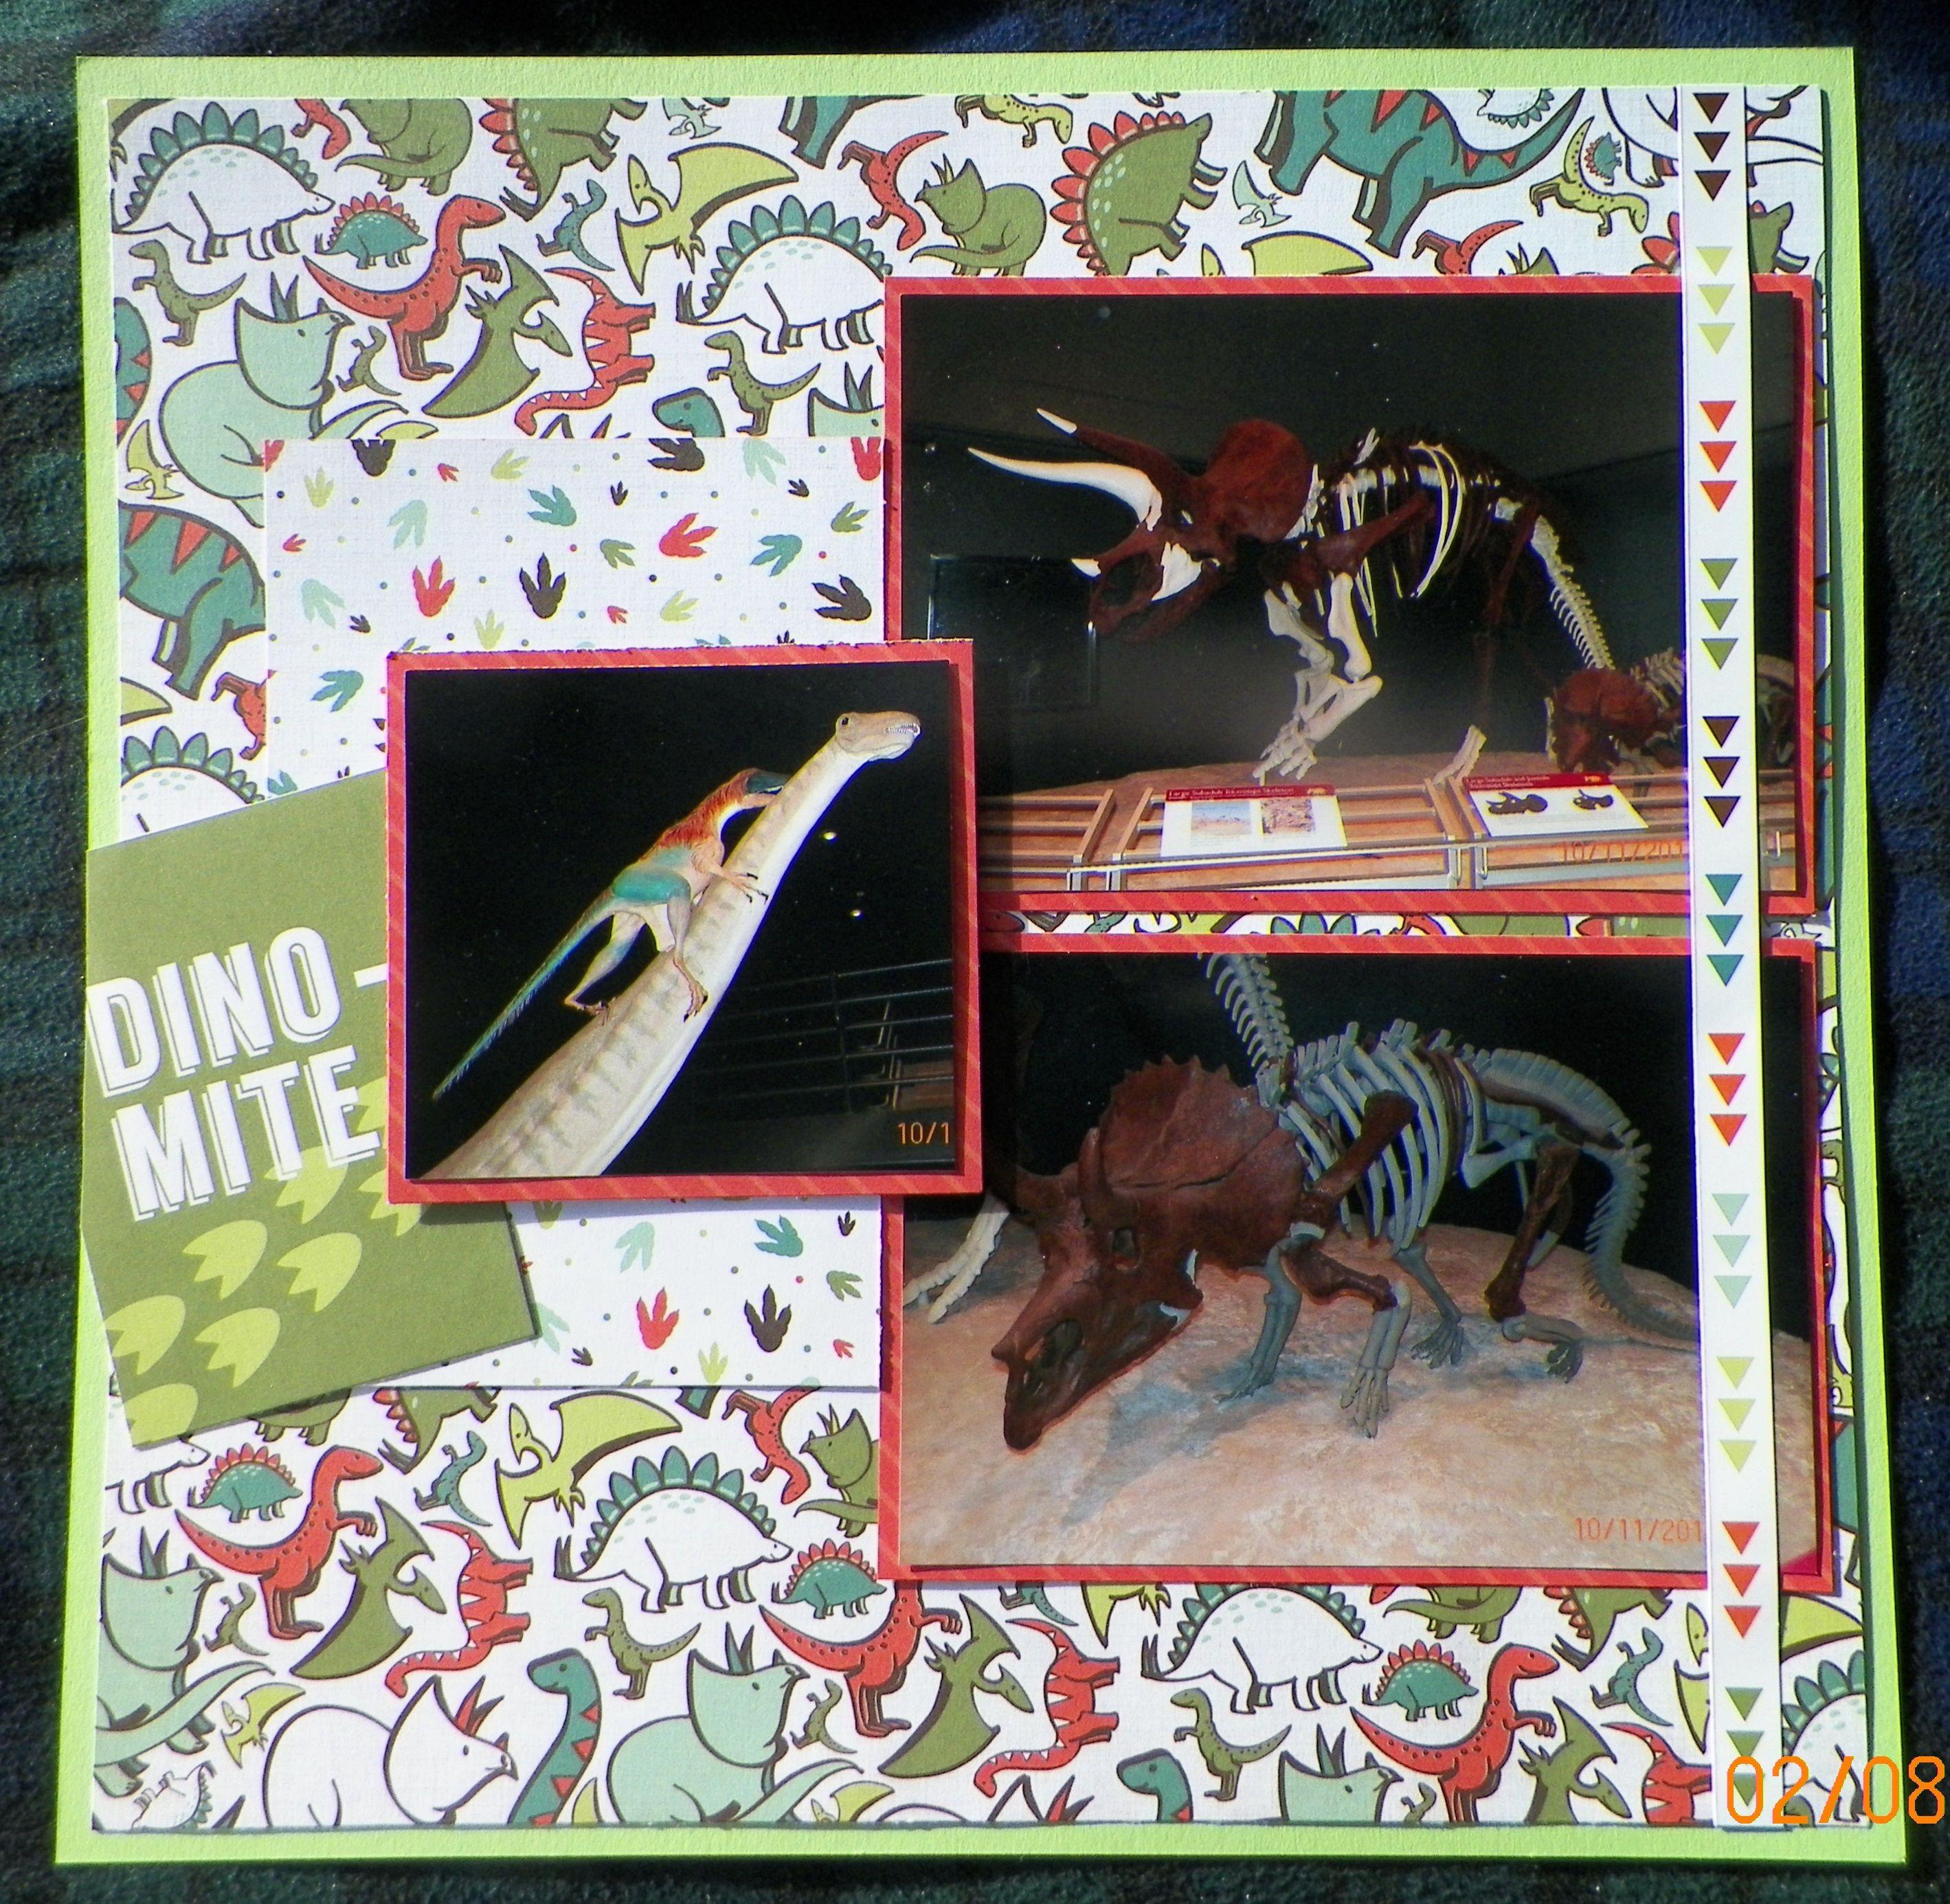 Scrapbook ideas adventure - Handmade Scrapbook Layout Echo Park Dinosaur Adventure Museum Of The Rockies Dinosaurs